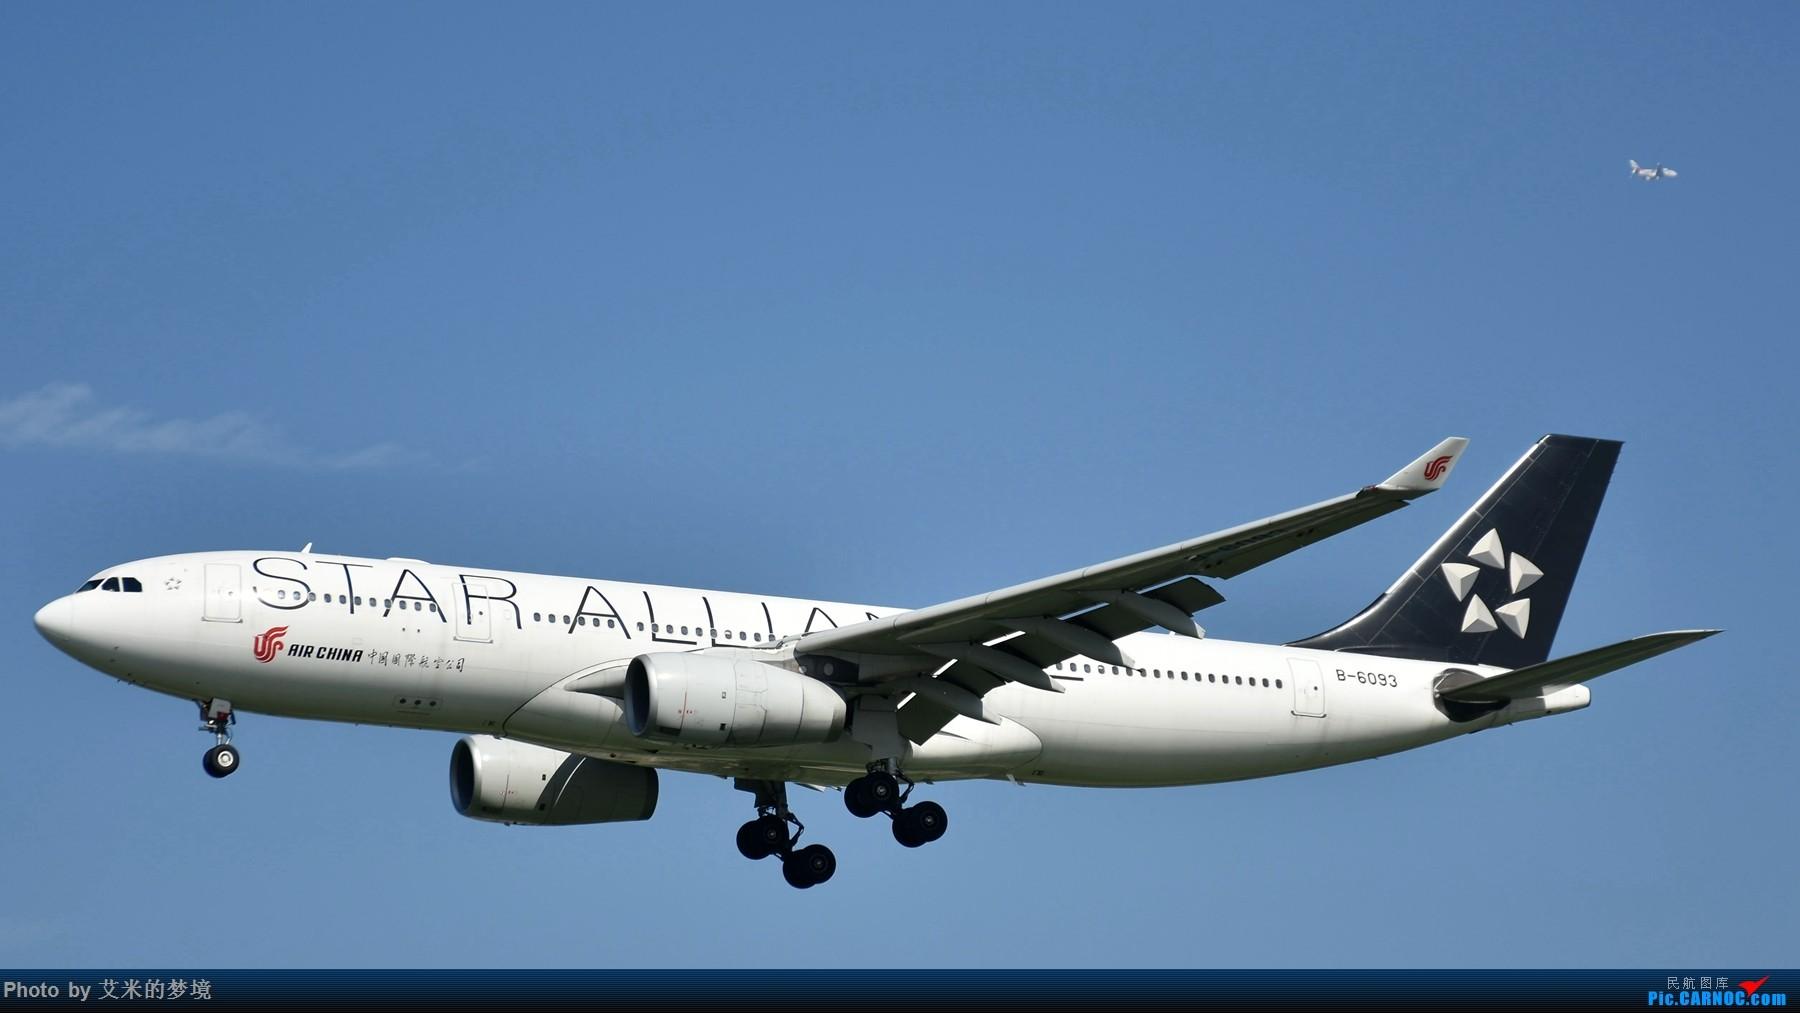 Re:[原创]【carnoc重庆飞友会】北京送行,所见飞行 AIRBUS A330-200 B-6093 中国北京首都国际机场